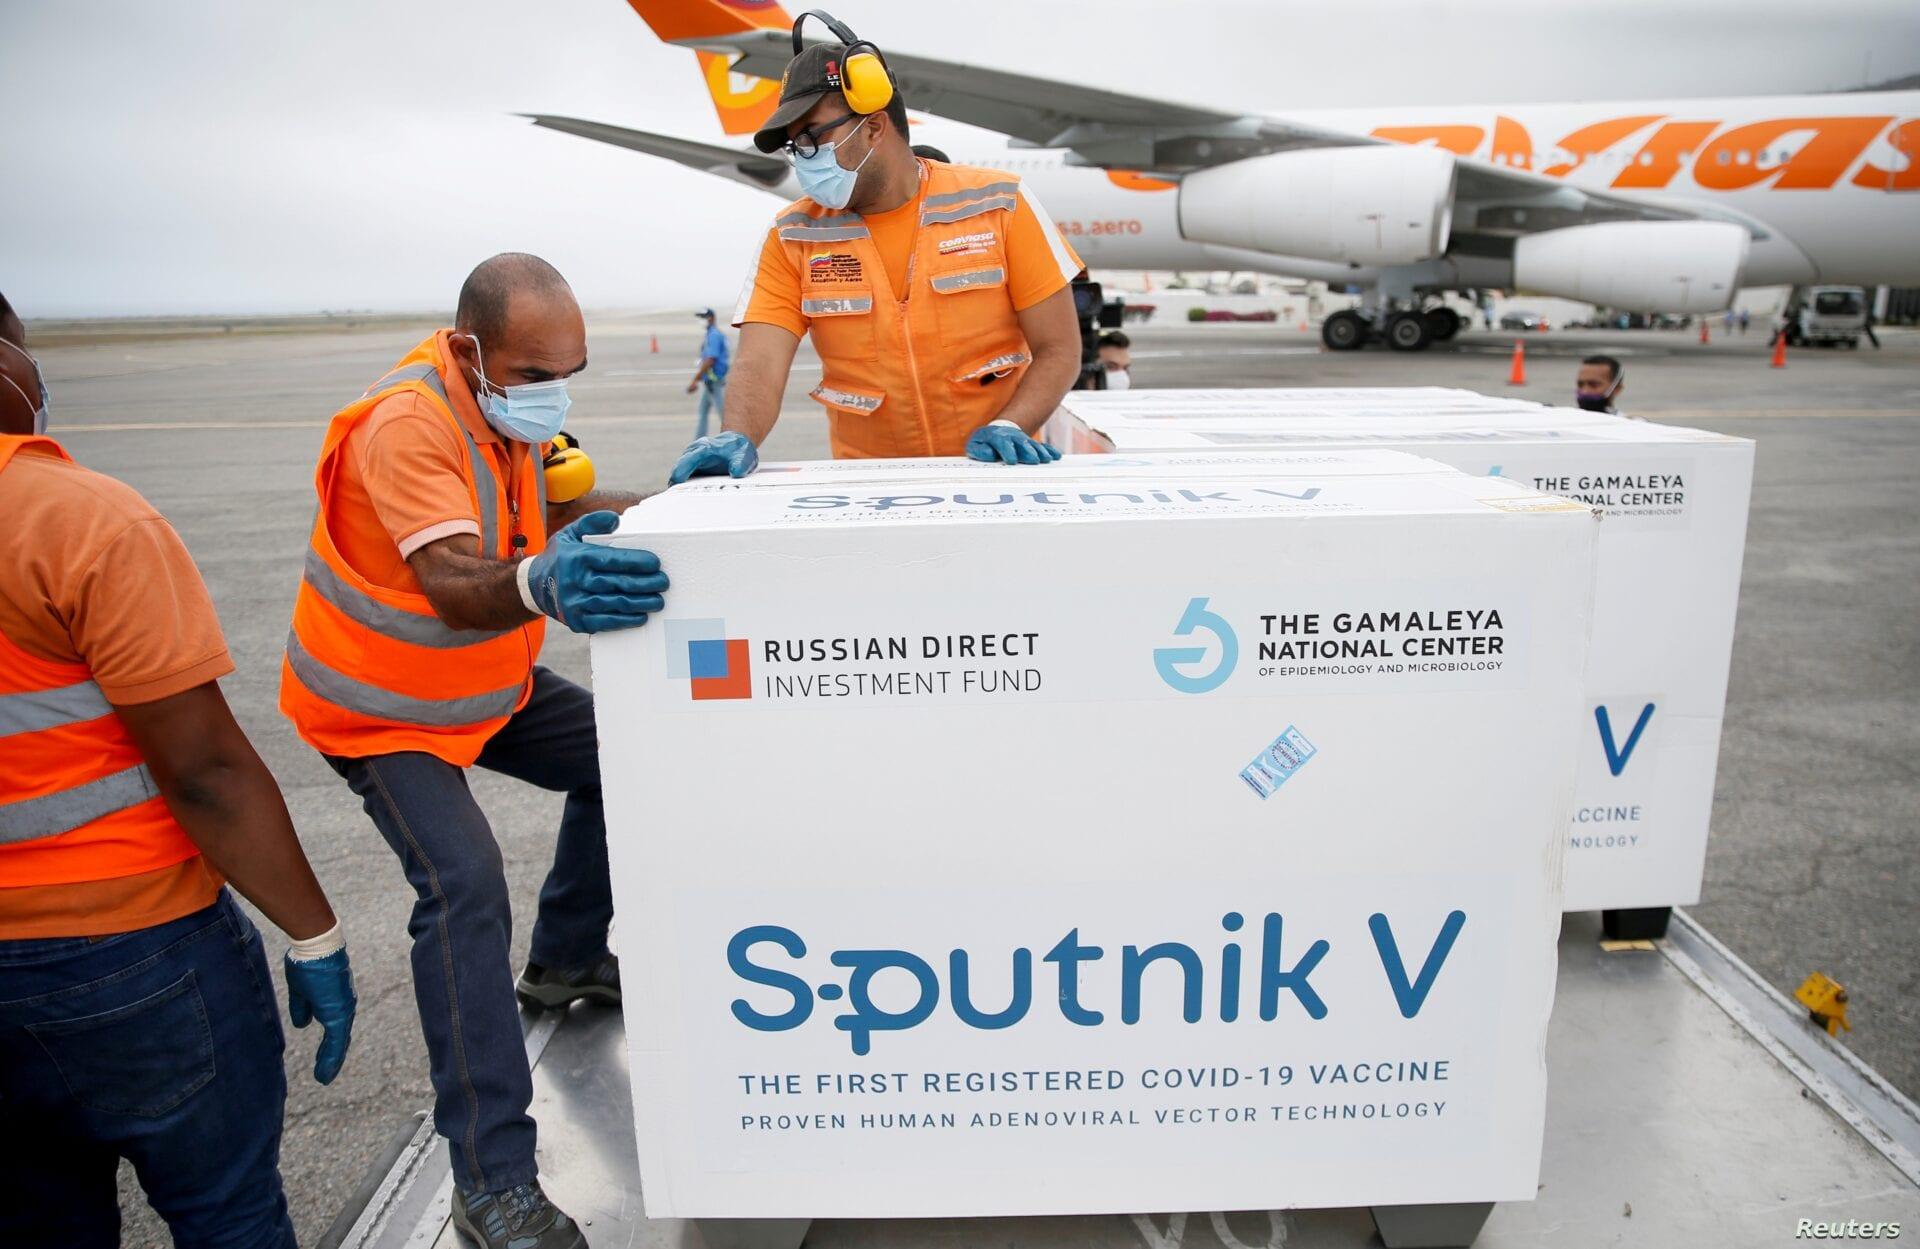 sputnik-arrival-vaccines